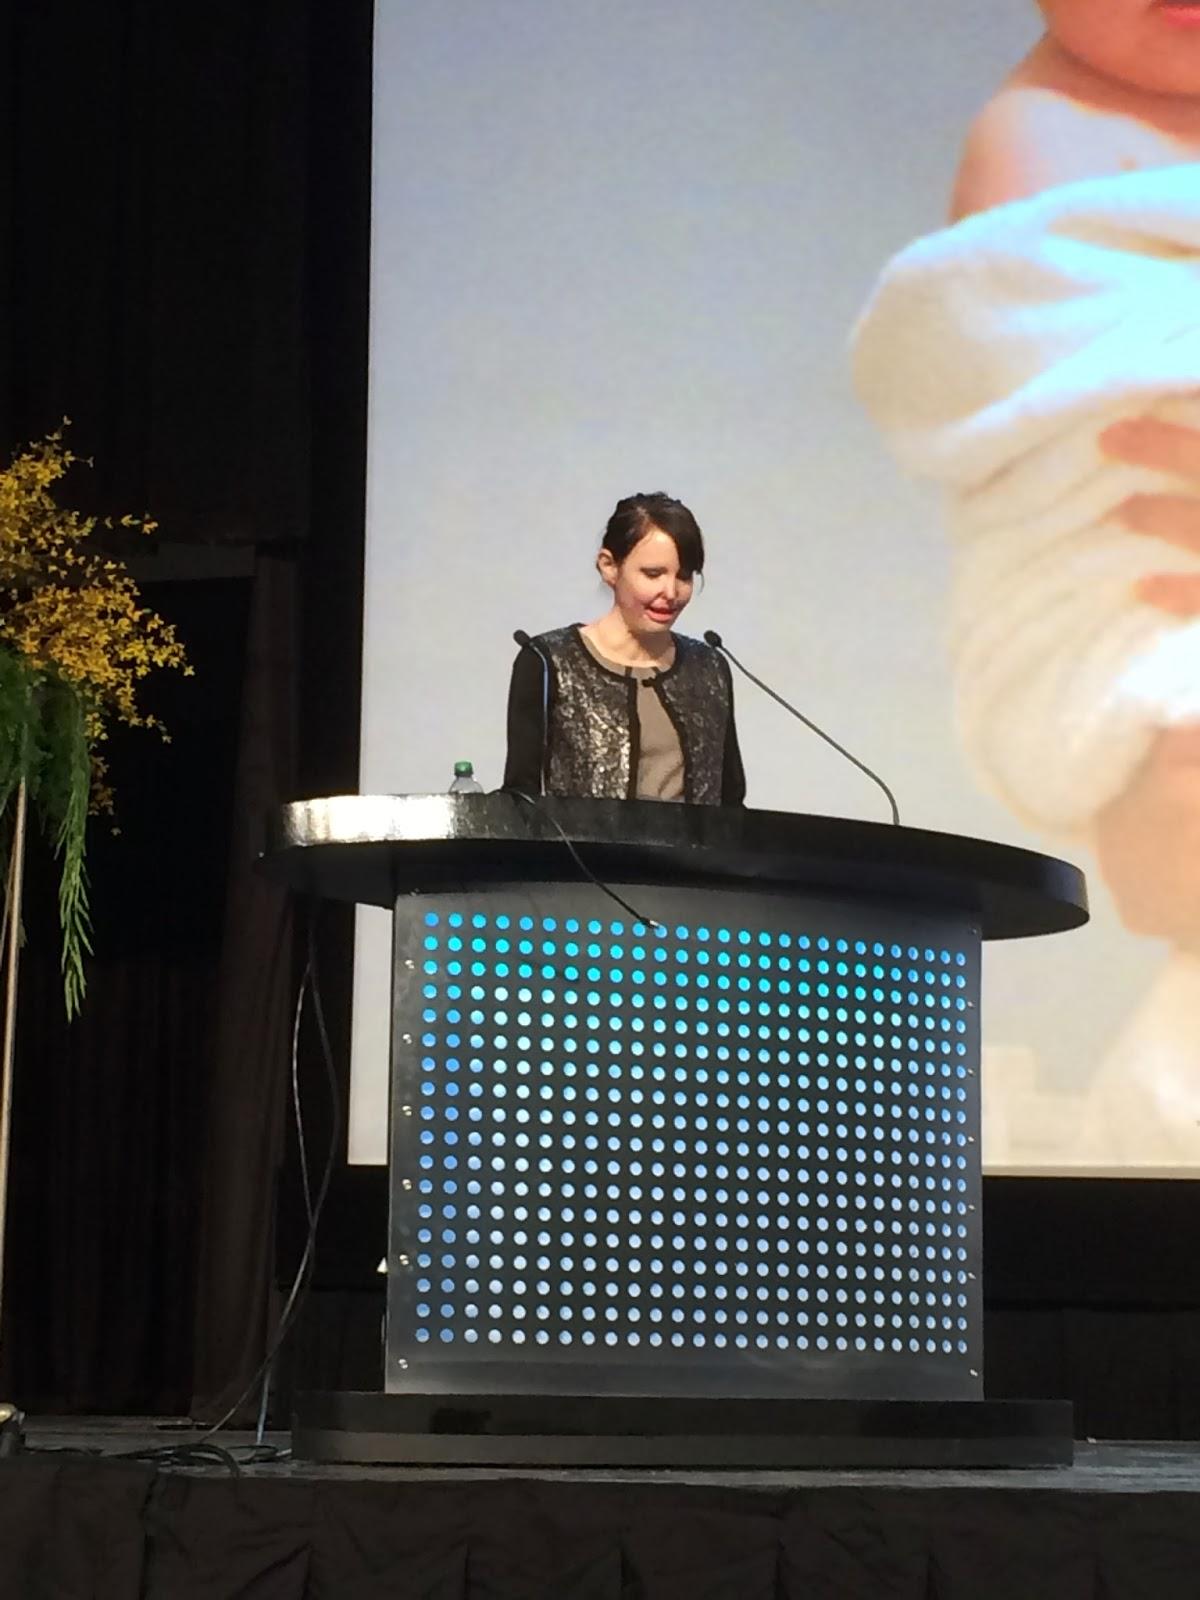 Stephanie Neilson of the NieNie Dialogues - Saturday Keynote #2